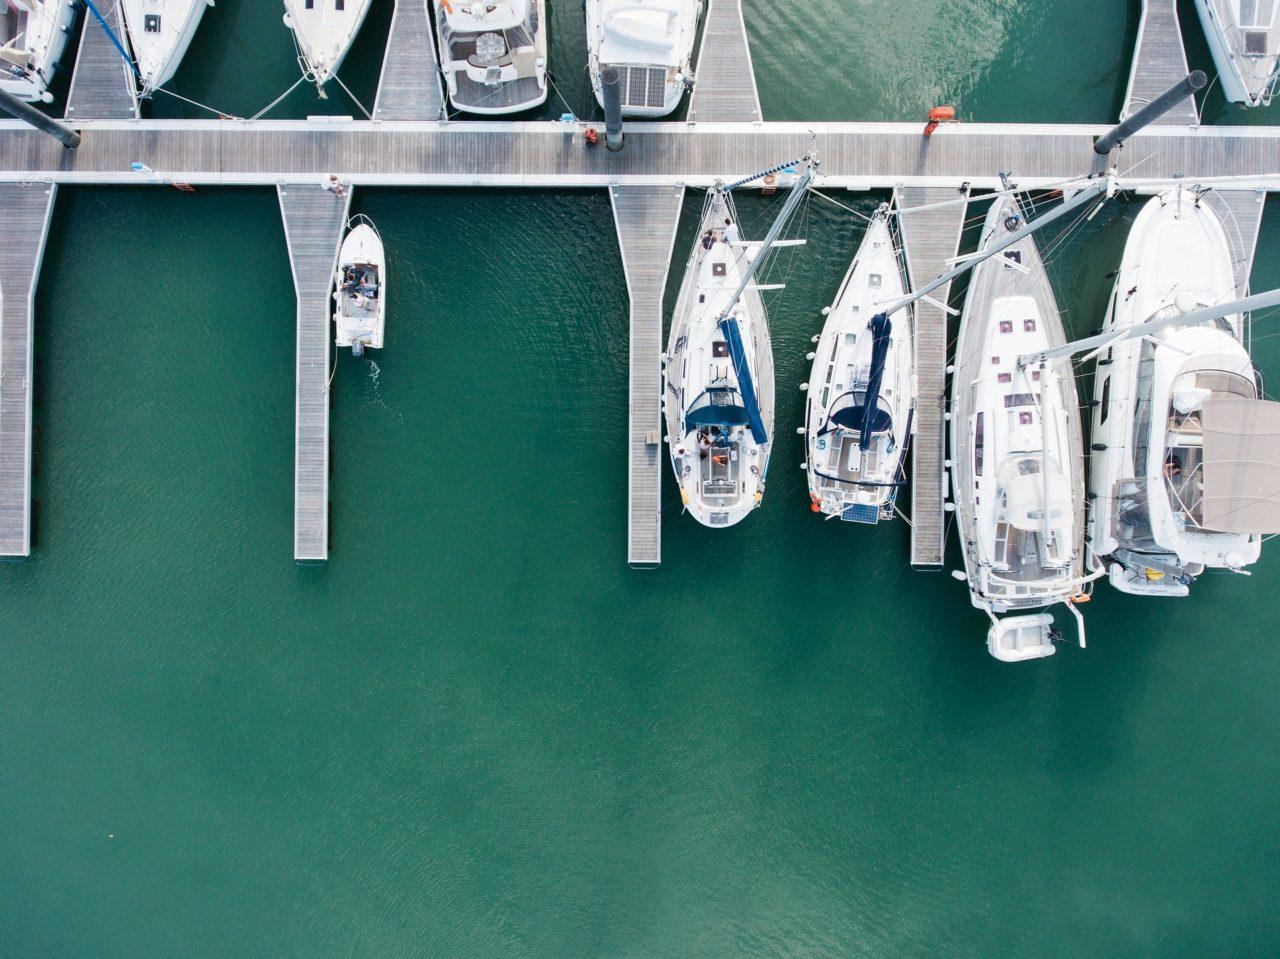 Private yachts docked at a marina. Photo: Pixabay.